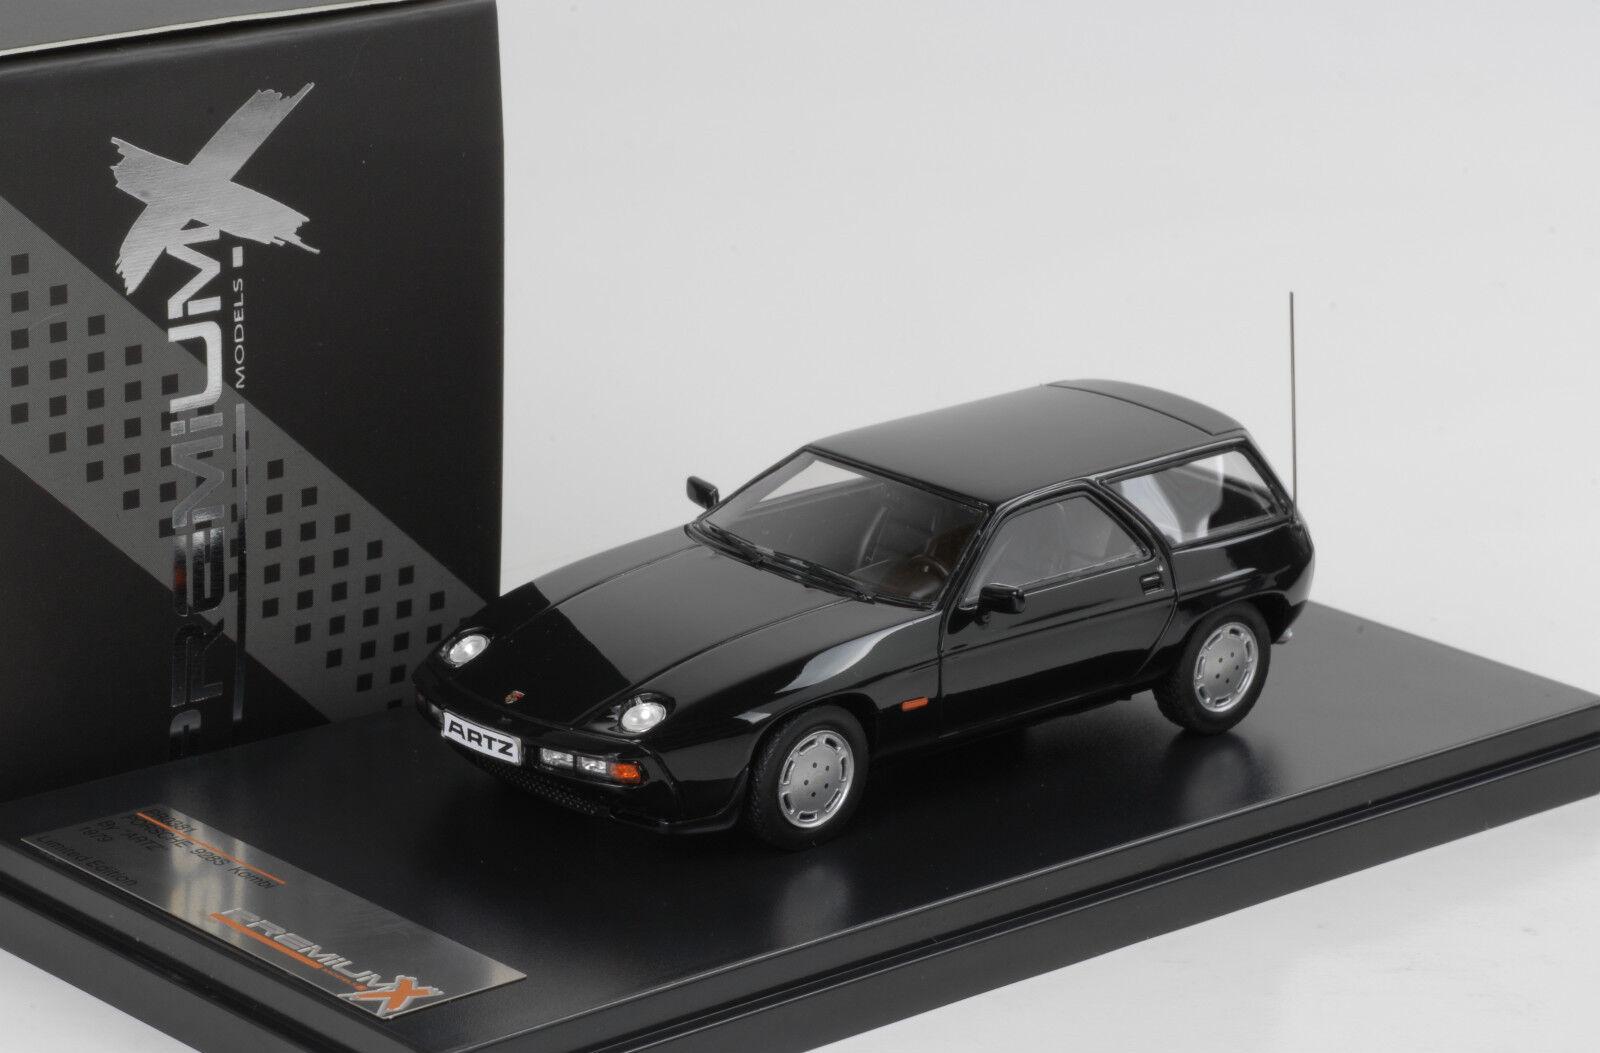 1979 Porsche 928 S Immobilier Break - Artz- Noir Noir 1 43 Premium X